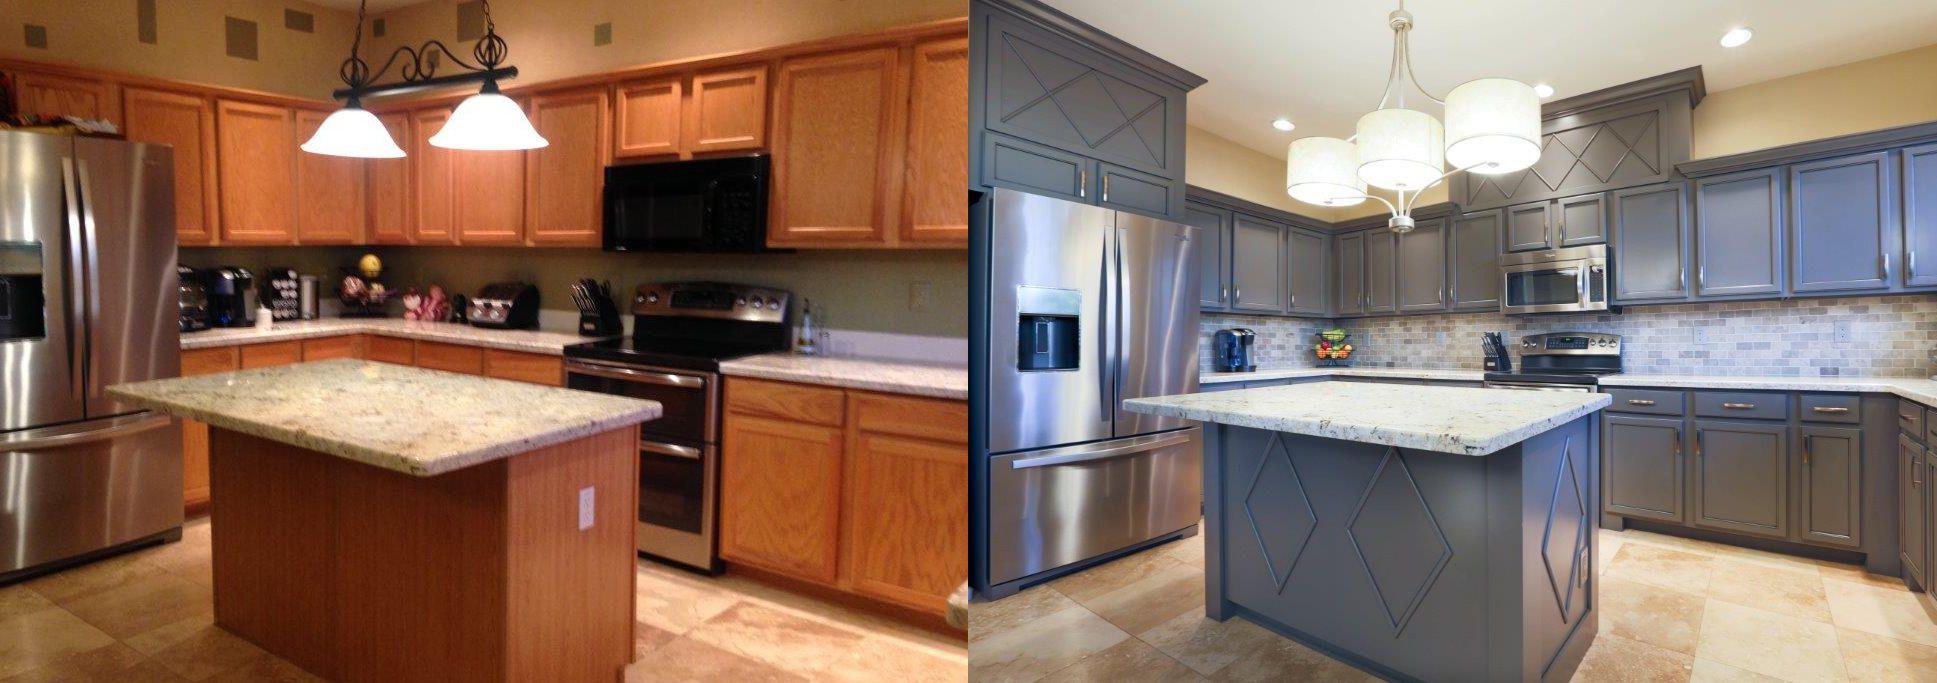 image result for refinishing kitchen cabinets white floors in 2018 rh pinterest com